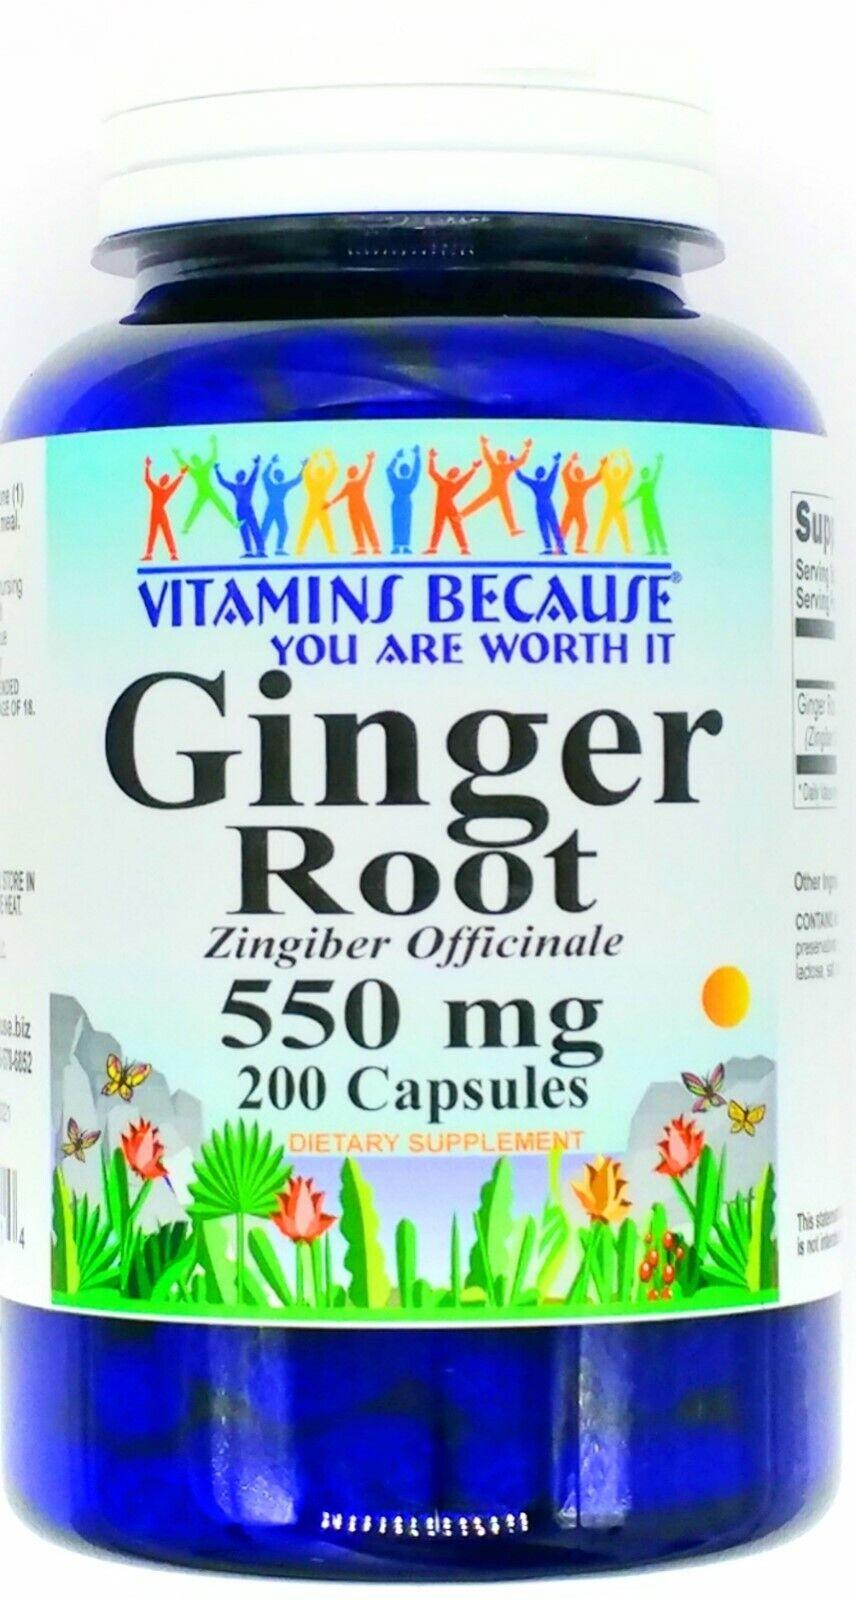 200 Capsule 550mg Ginger Root Motion Sickness Nausea Natural Gluten Free Pill VB